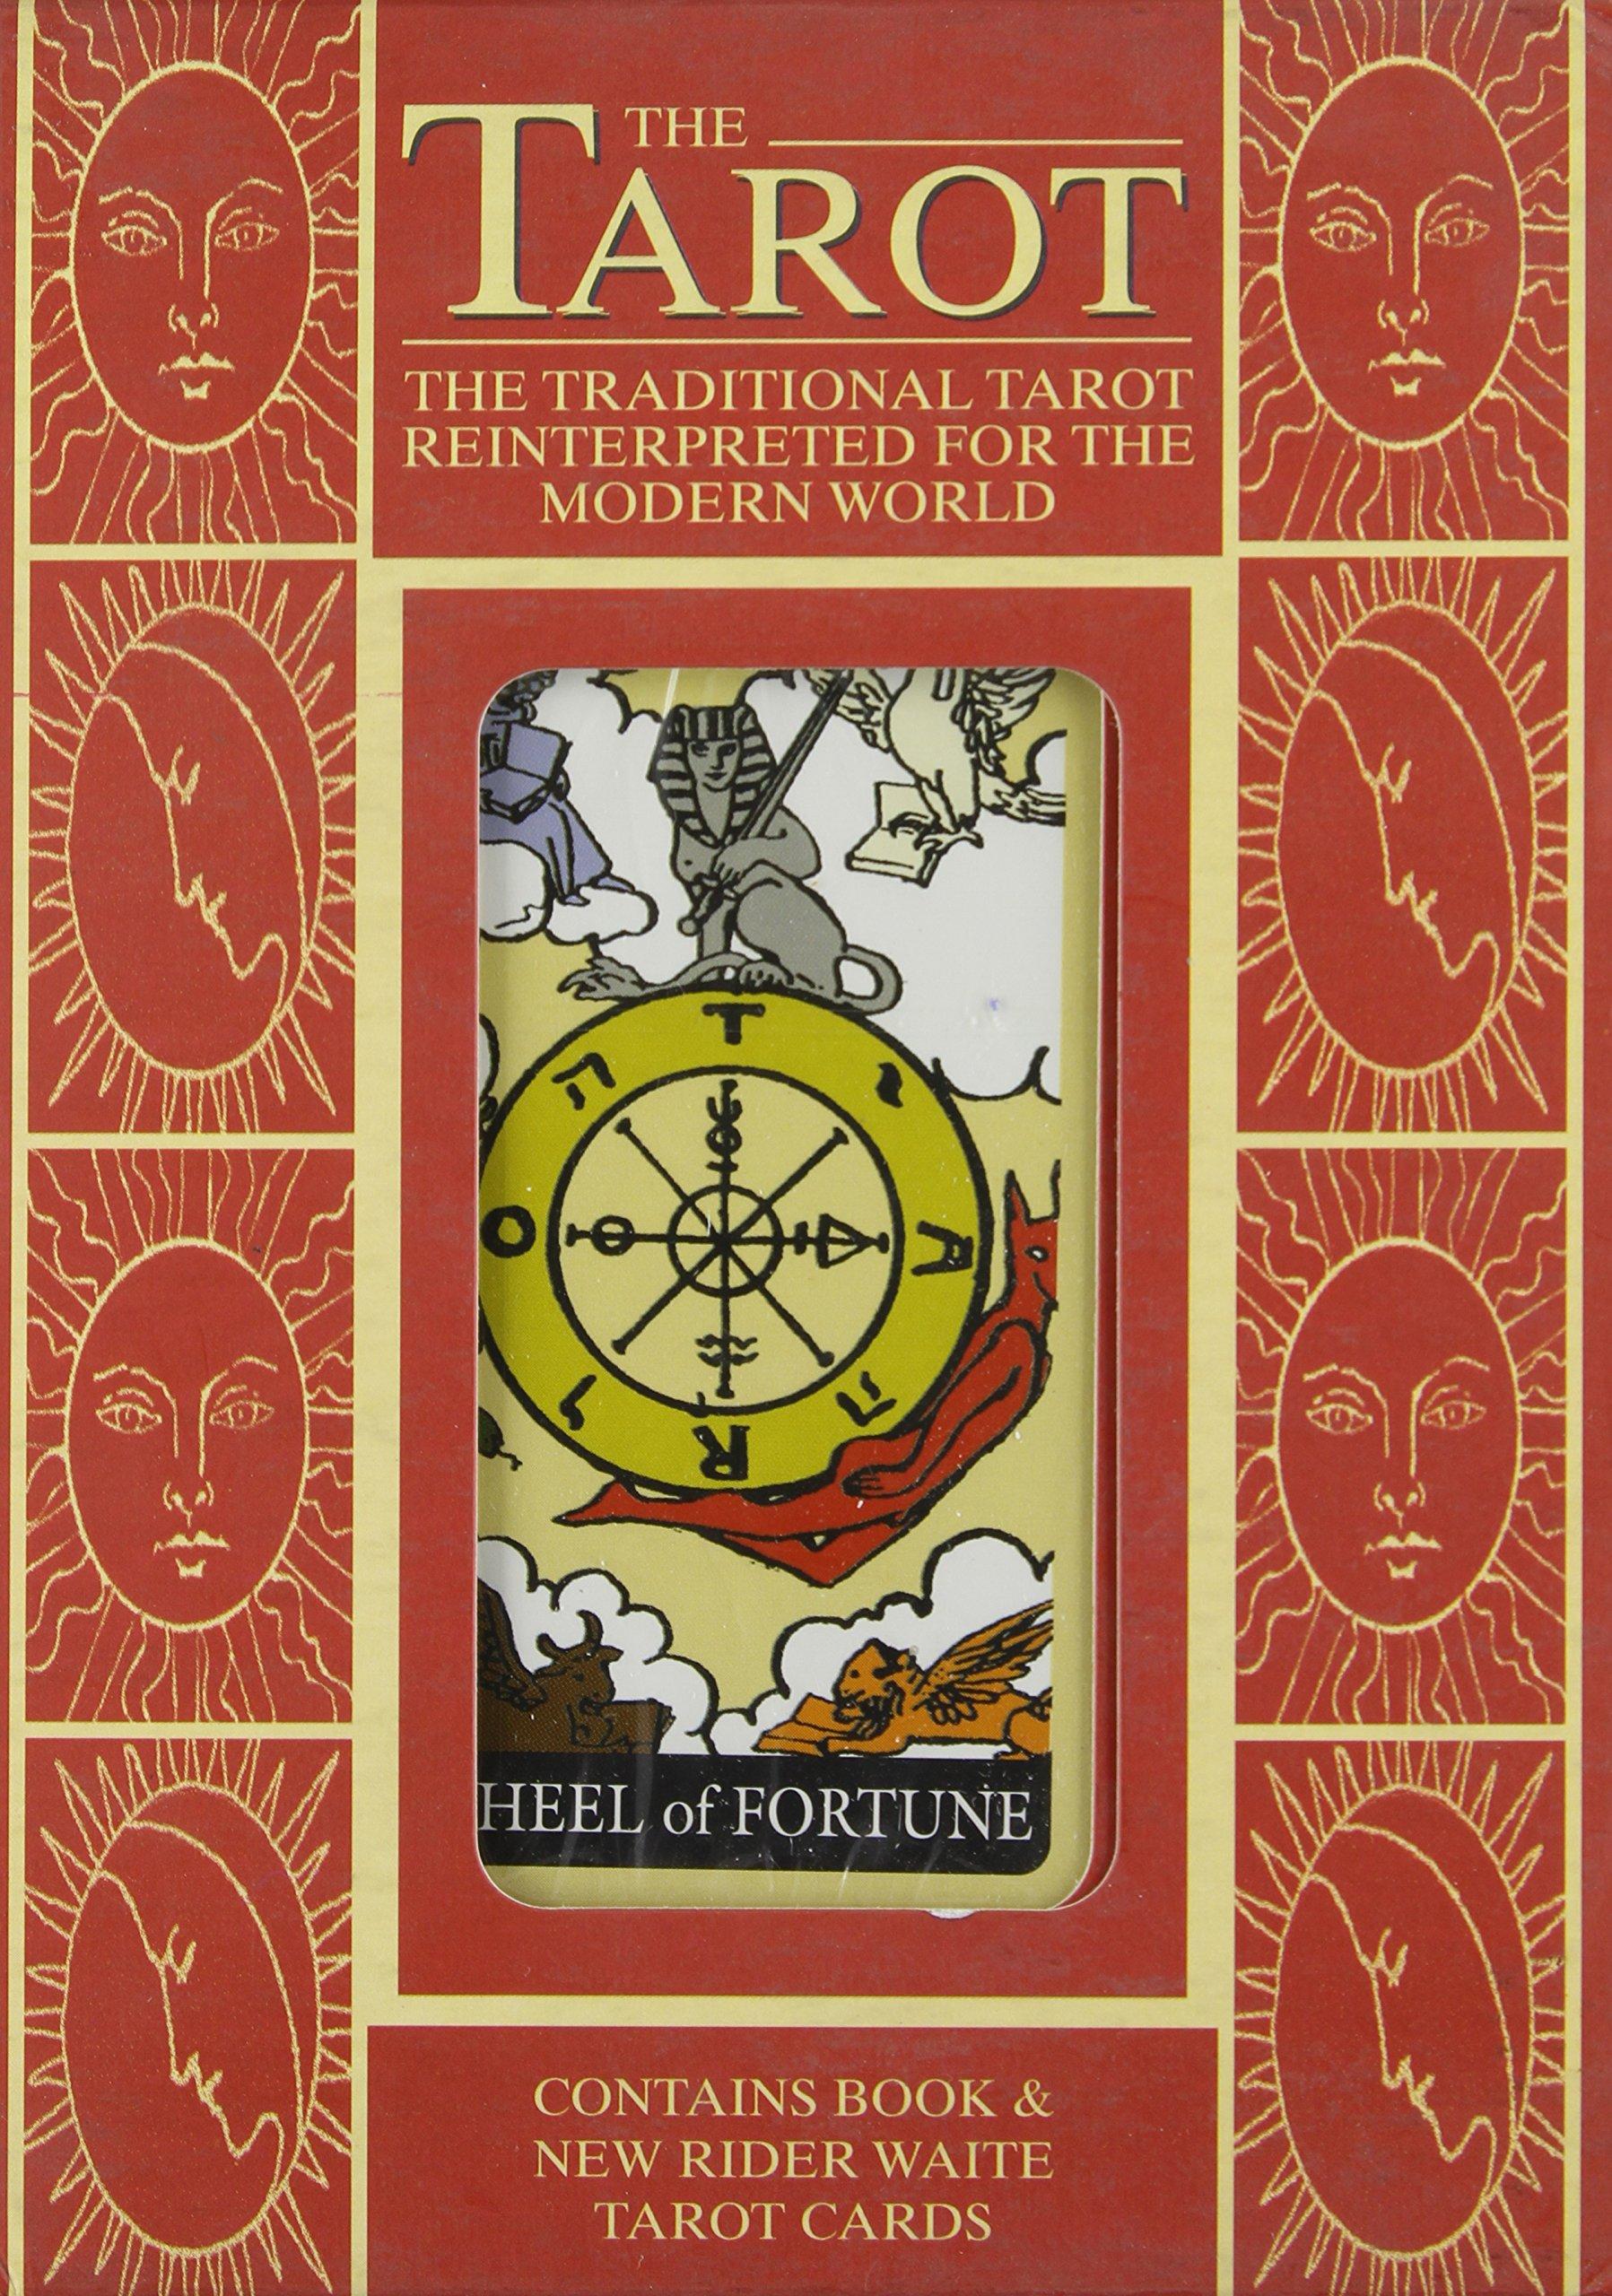 The Tarot Pack: The Traditional Tarot Reinterpreted for the Modern World: Amazon.es: Fronteras, Adam: Libros en idiomas extranjeros